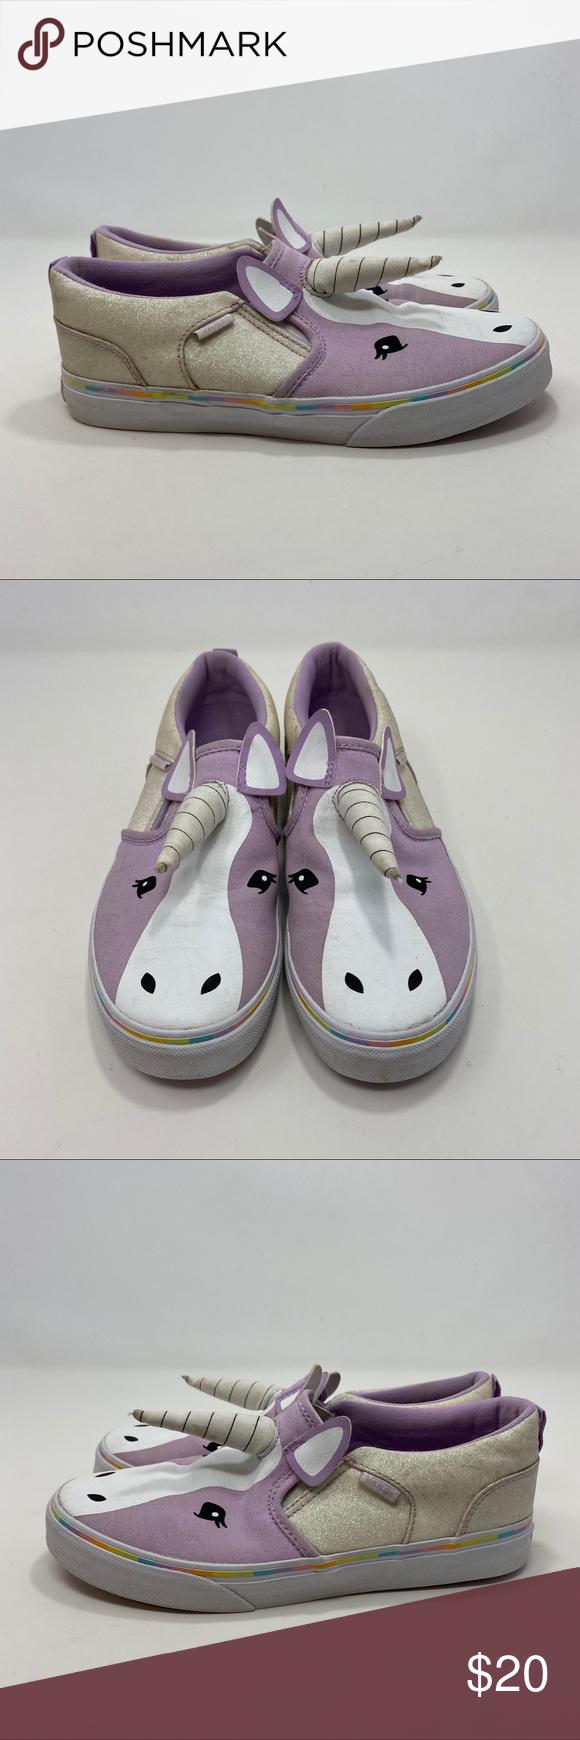 Vans Kids Purple Unicorn Slip On Shoes